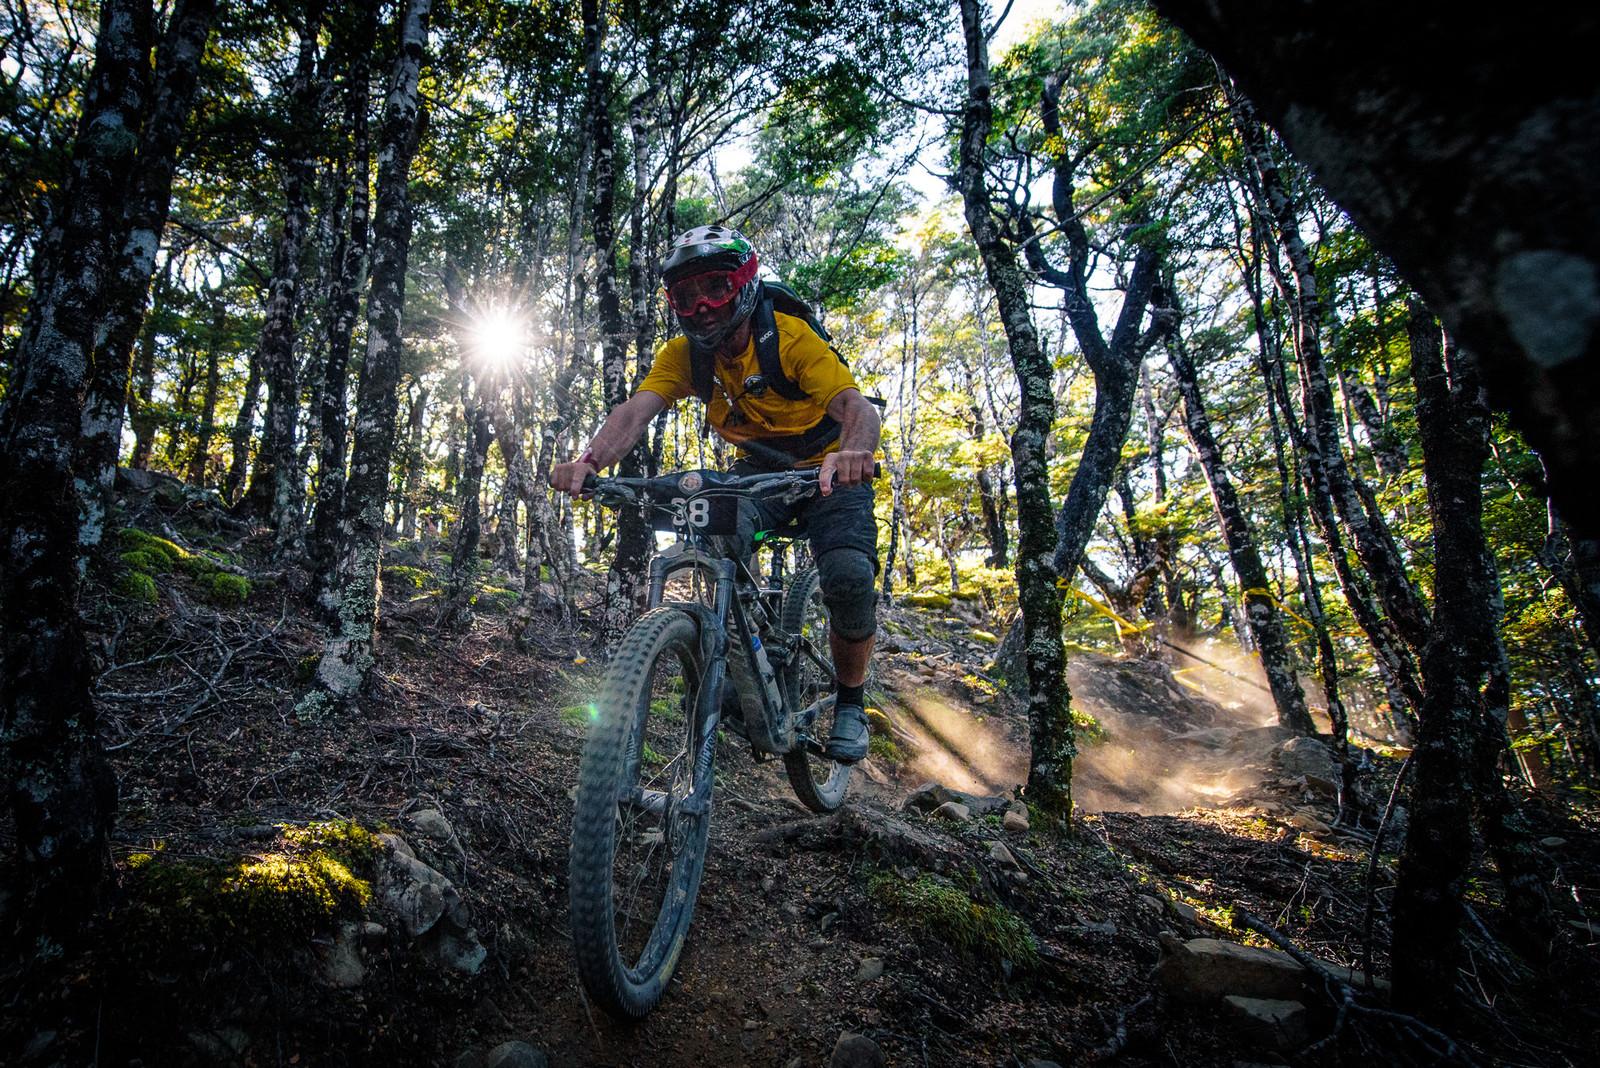 Barrie Wallington - 2019 Dodzy Memorial Enduro - Mountain Biking Pictures - Vital MTB